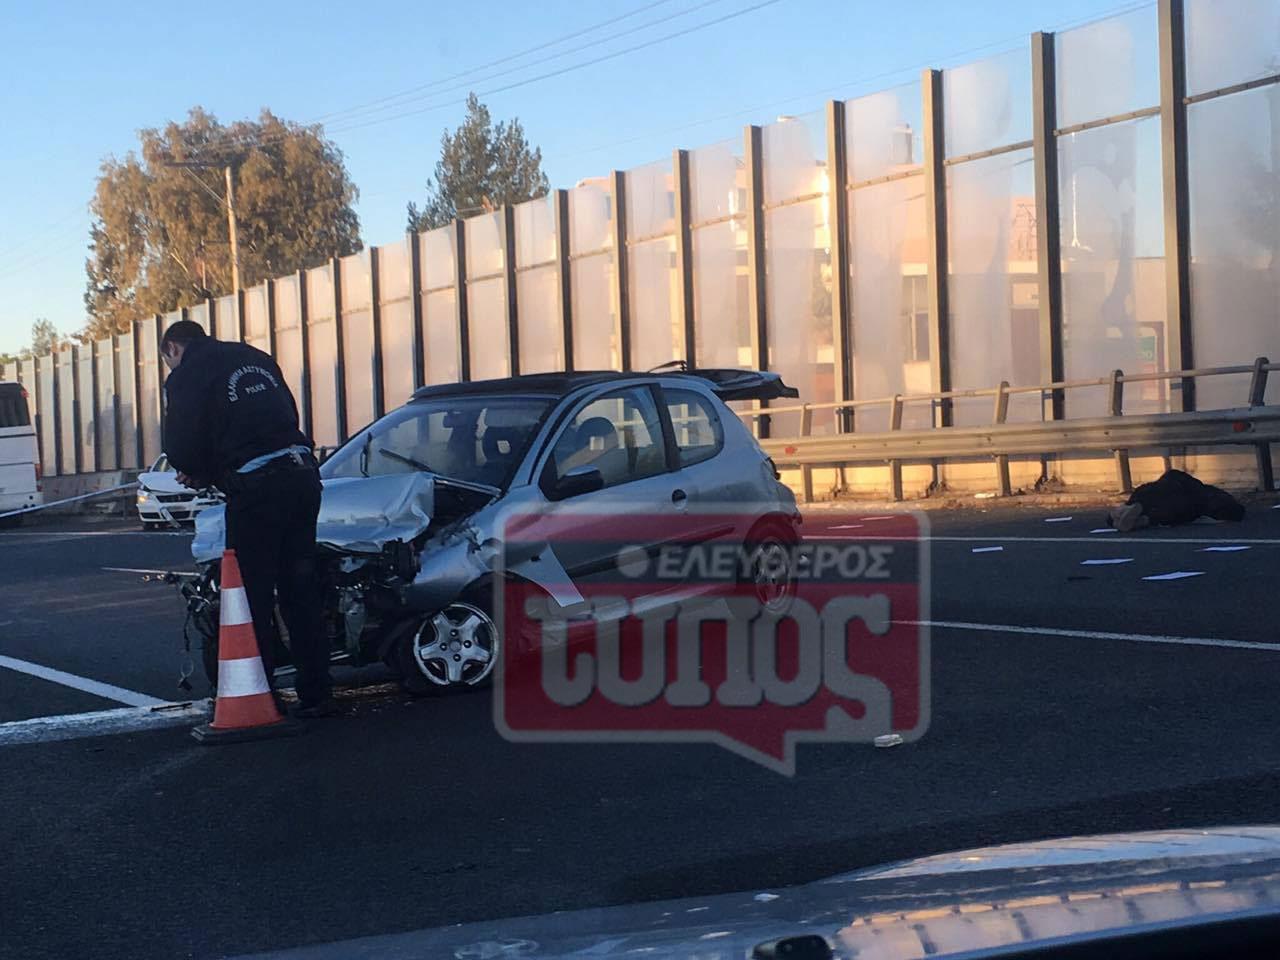 t5roxaio-ethinik-odos-traumaties-1300-5 Ατύχημα με τραυματία στην εθνική οδό: Μποτιλιάρισμα με ουρές χιλιομέτρων [εικόνες]